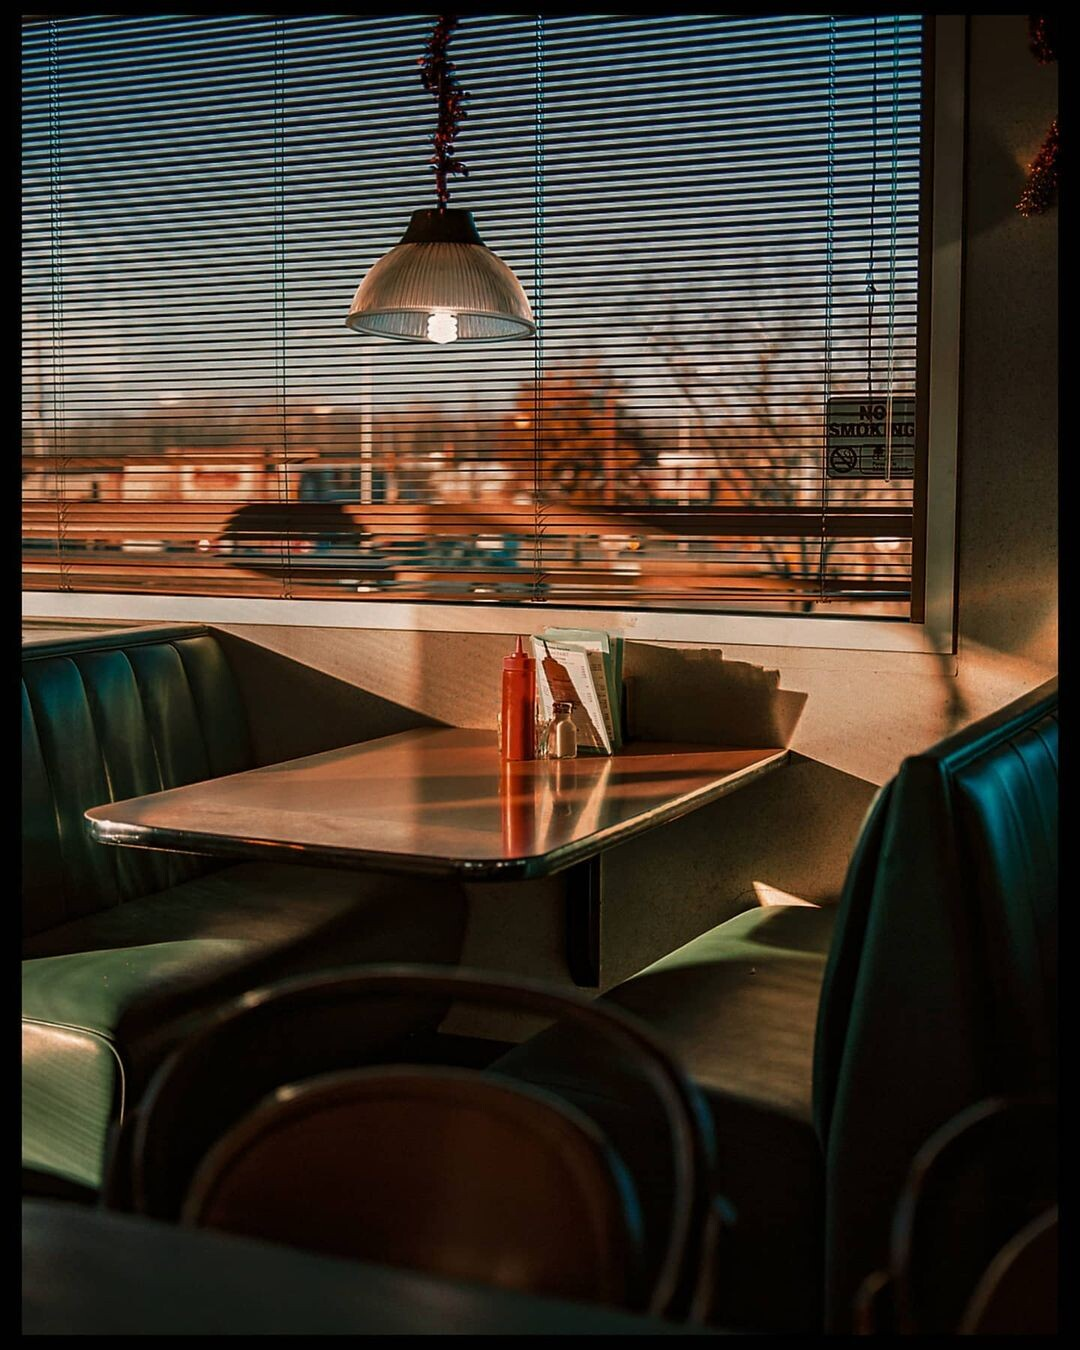 Канзас-Сити, Миссури, 2018. Фотограф TK (tk.somewhere)